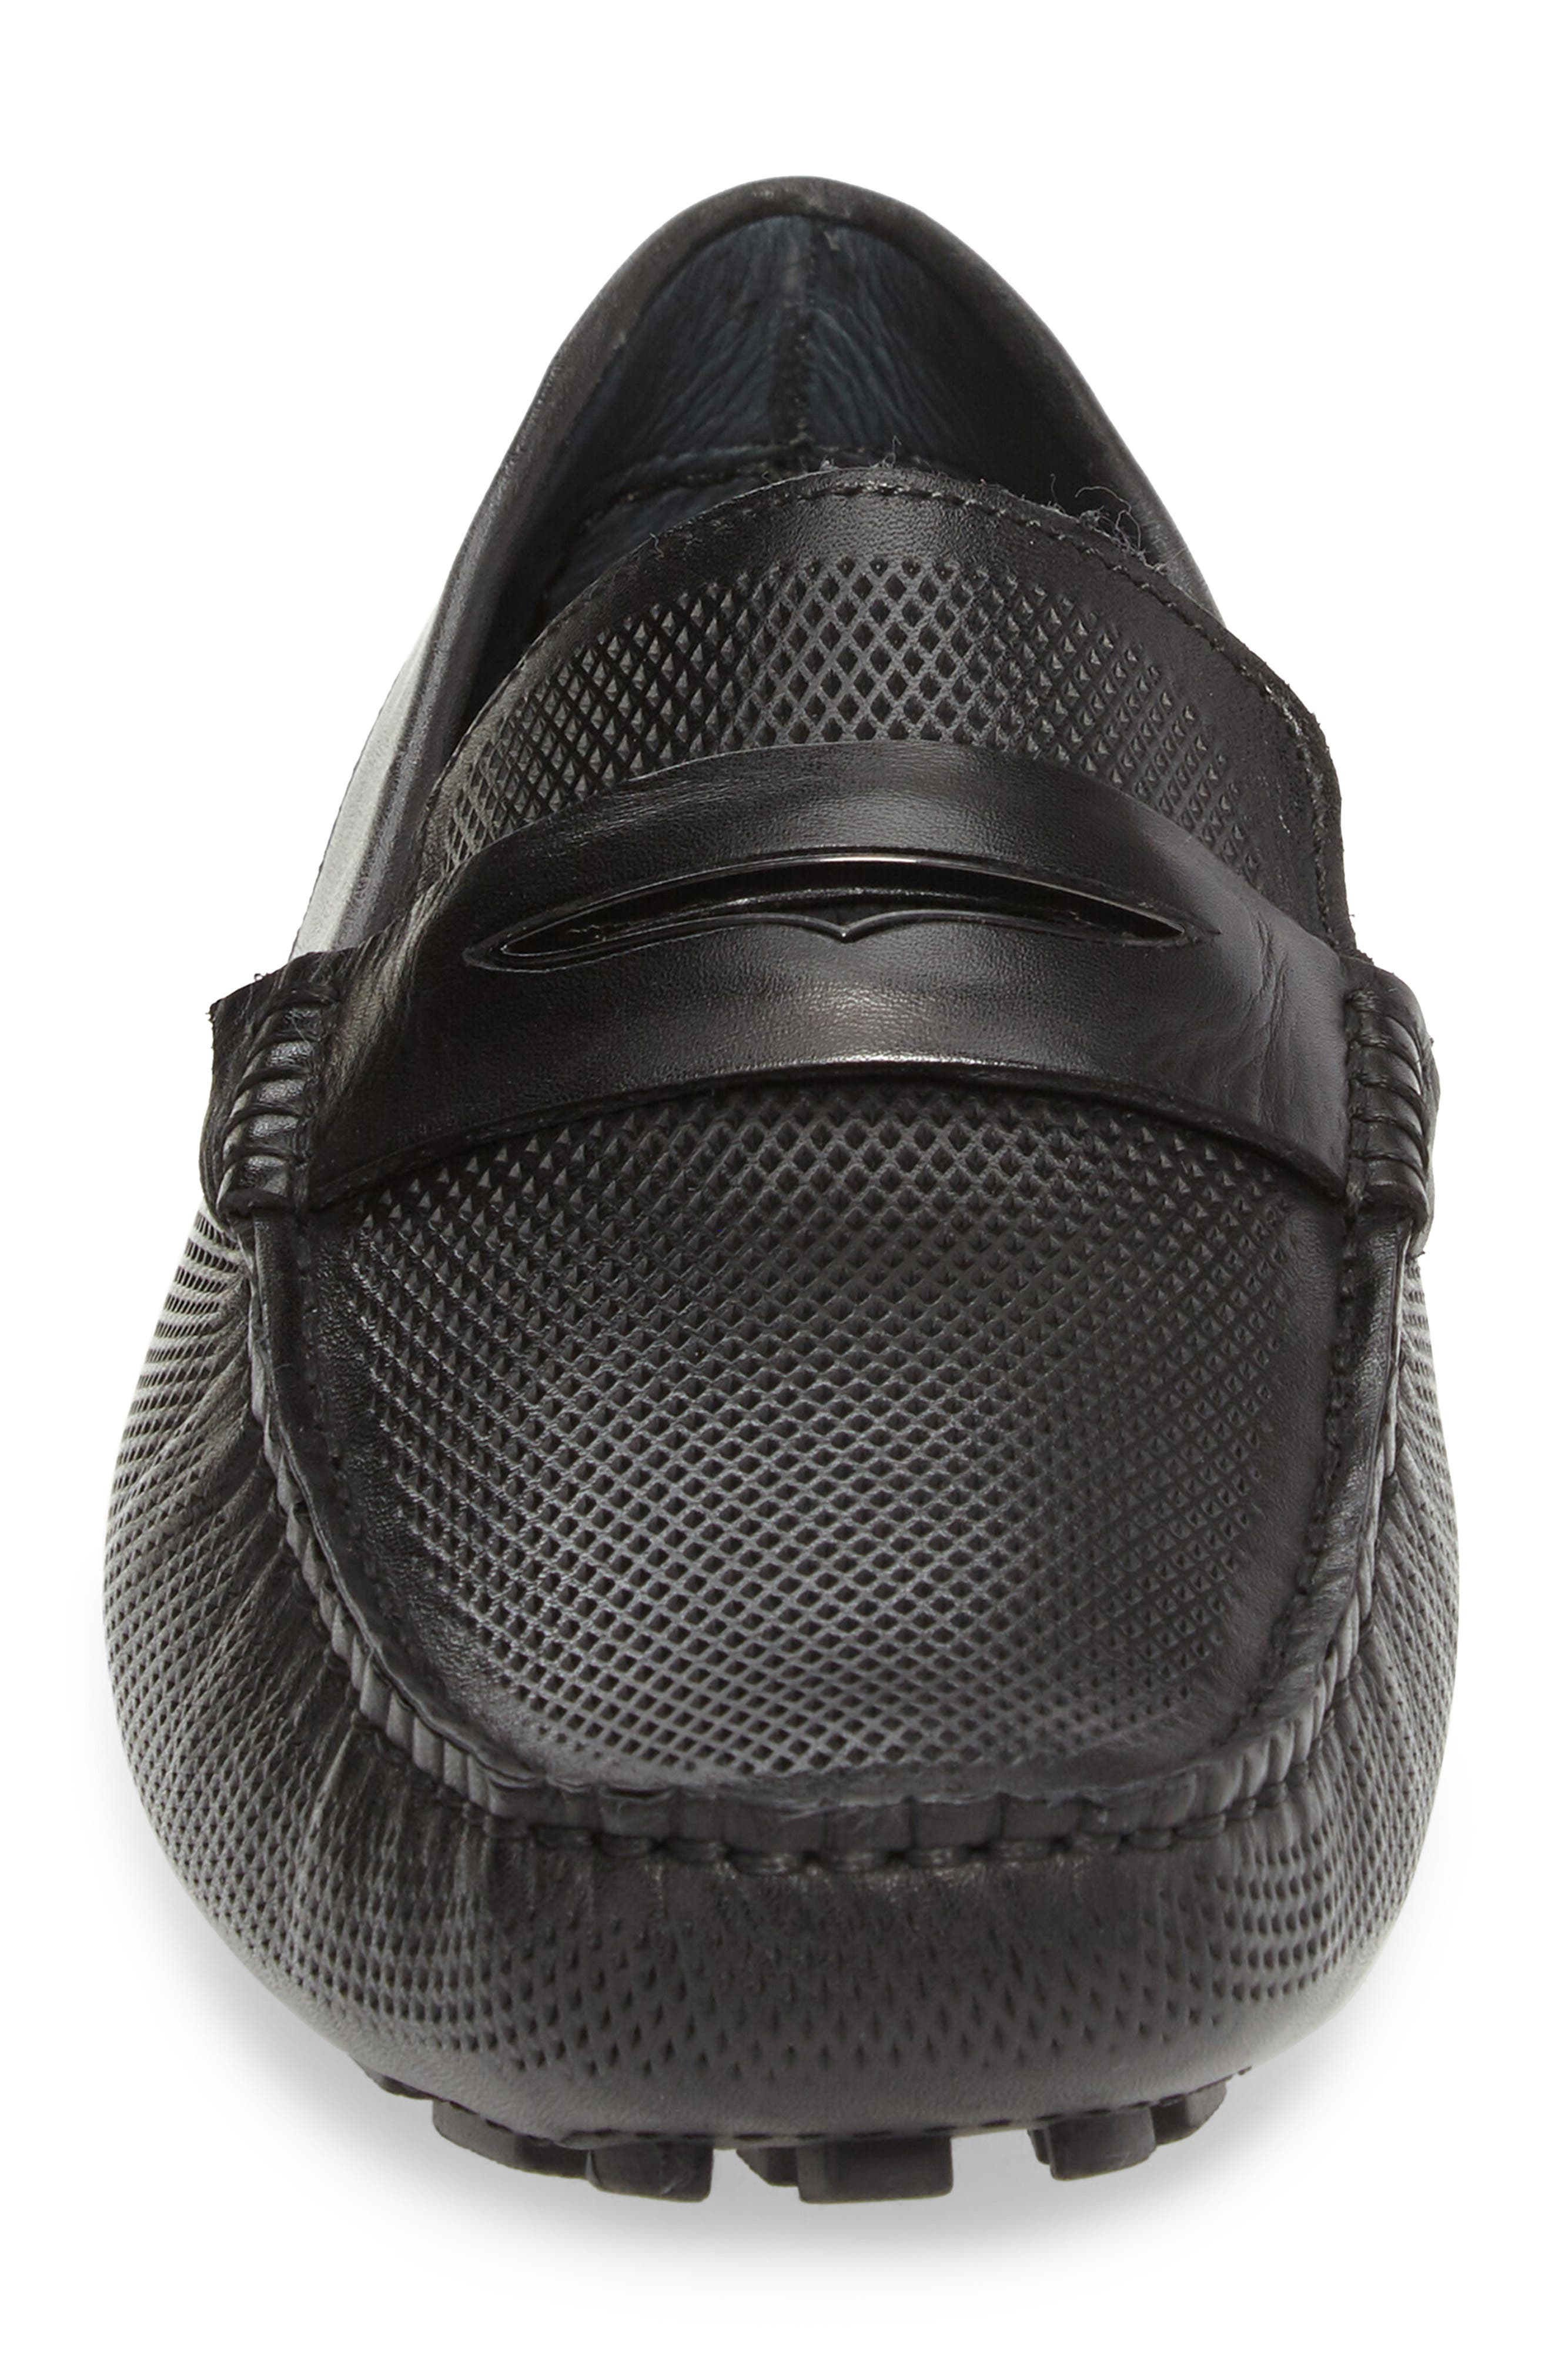 Mondrian Driving Shoe,                             Alternate thumbnail 4, color,                             001